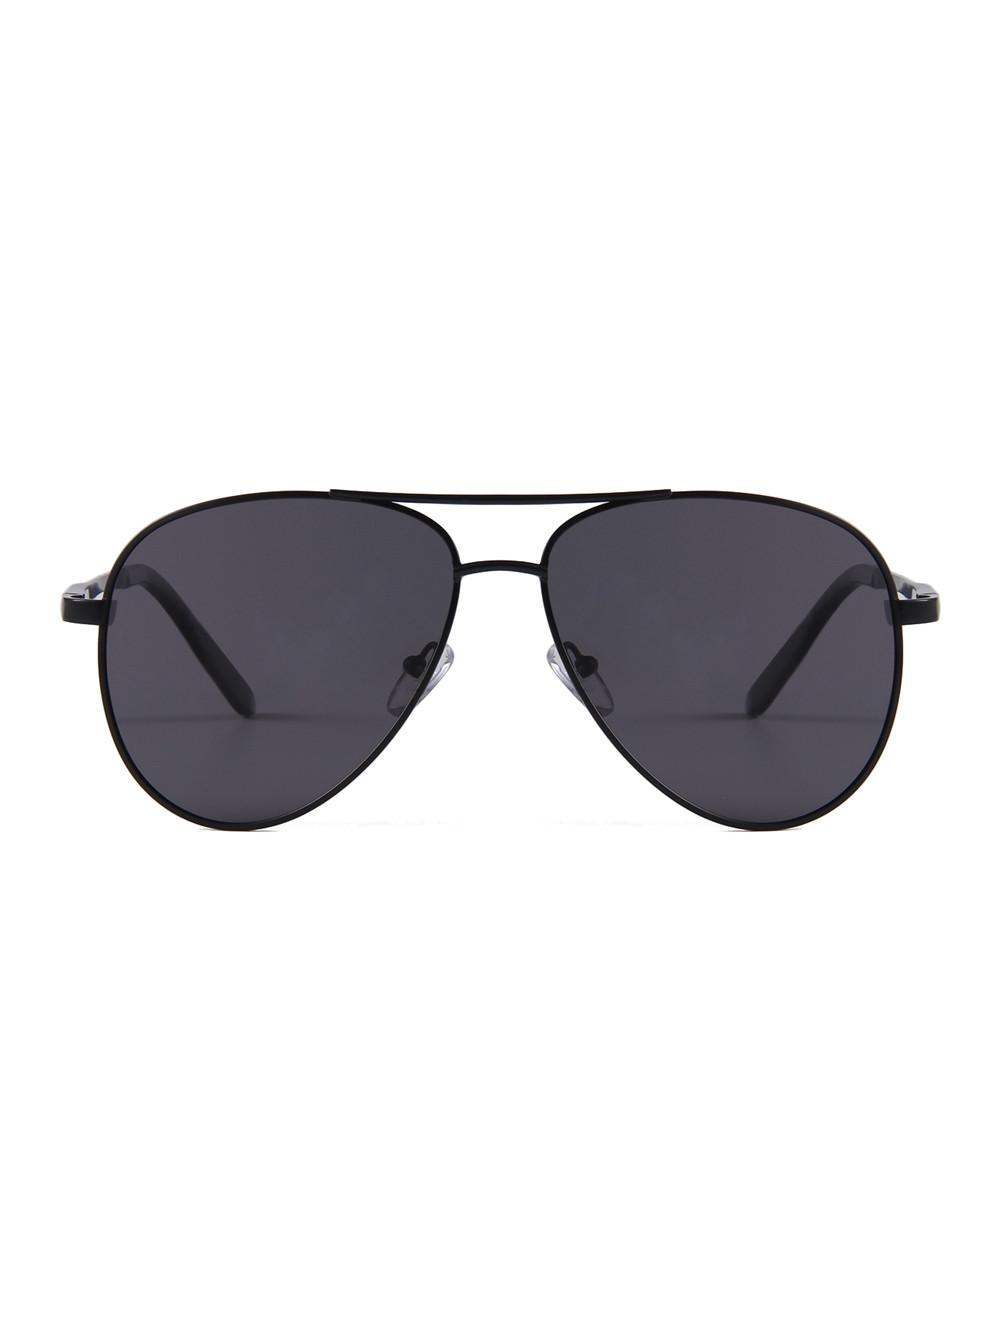 Slnečné okuliare Aviator Premium Black polarizačné 7ef5cfcacfe